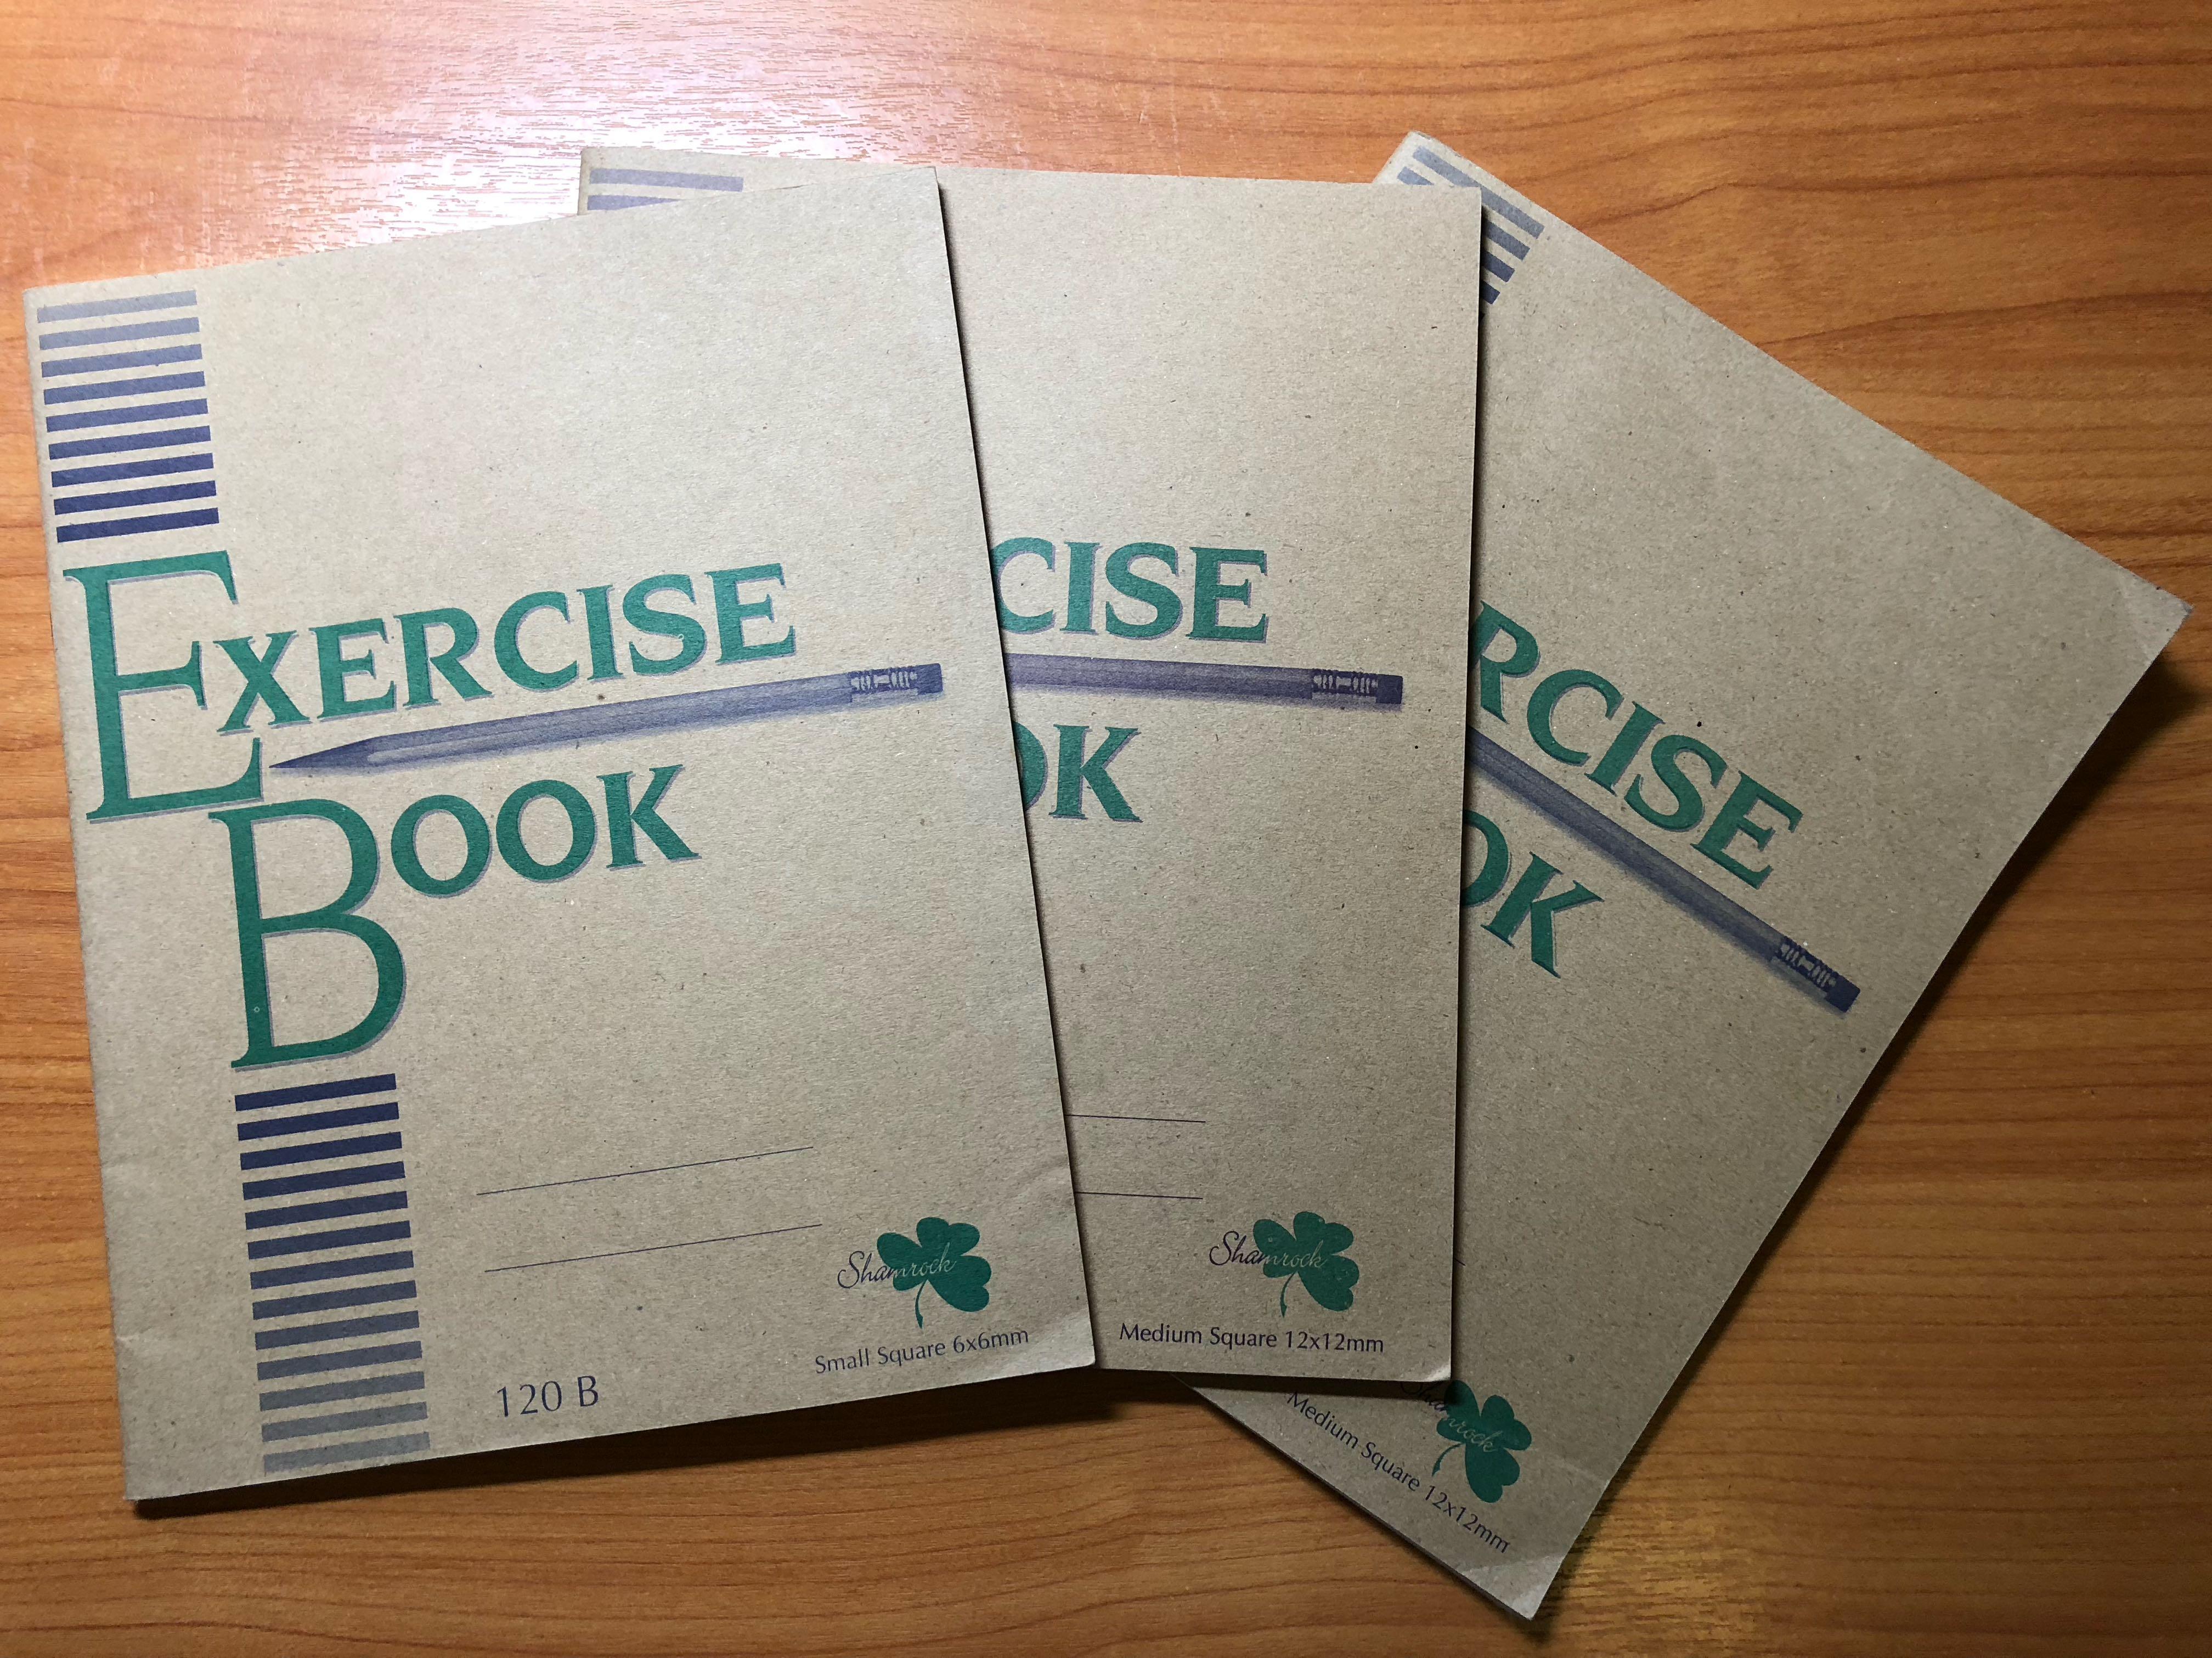 Chinese exercise books, Books & Stationery, Stationery on